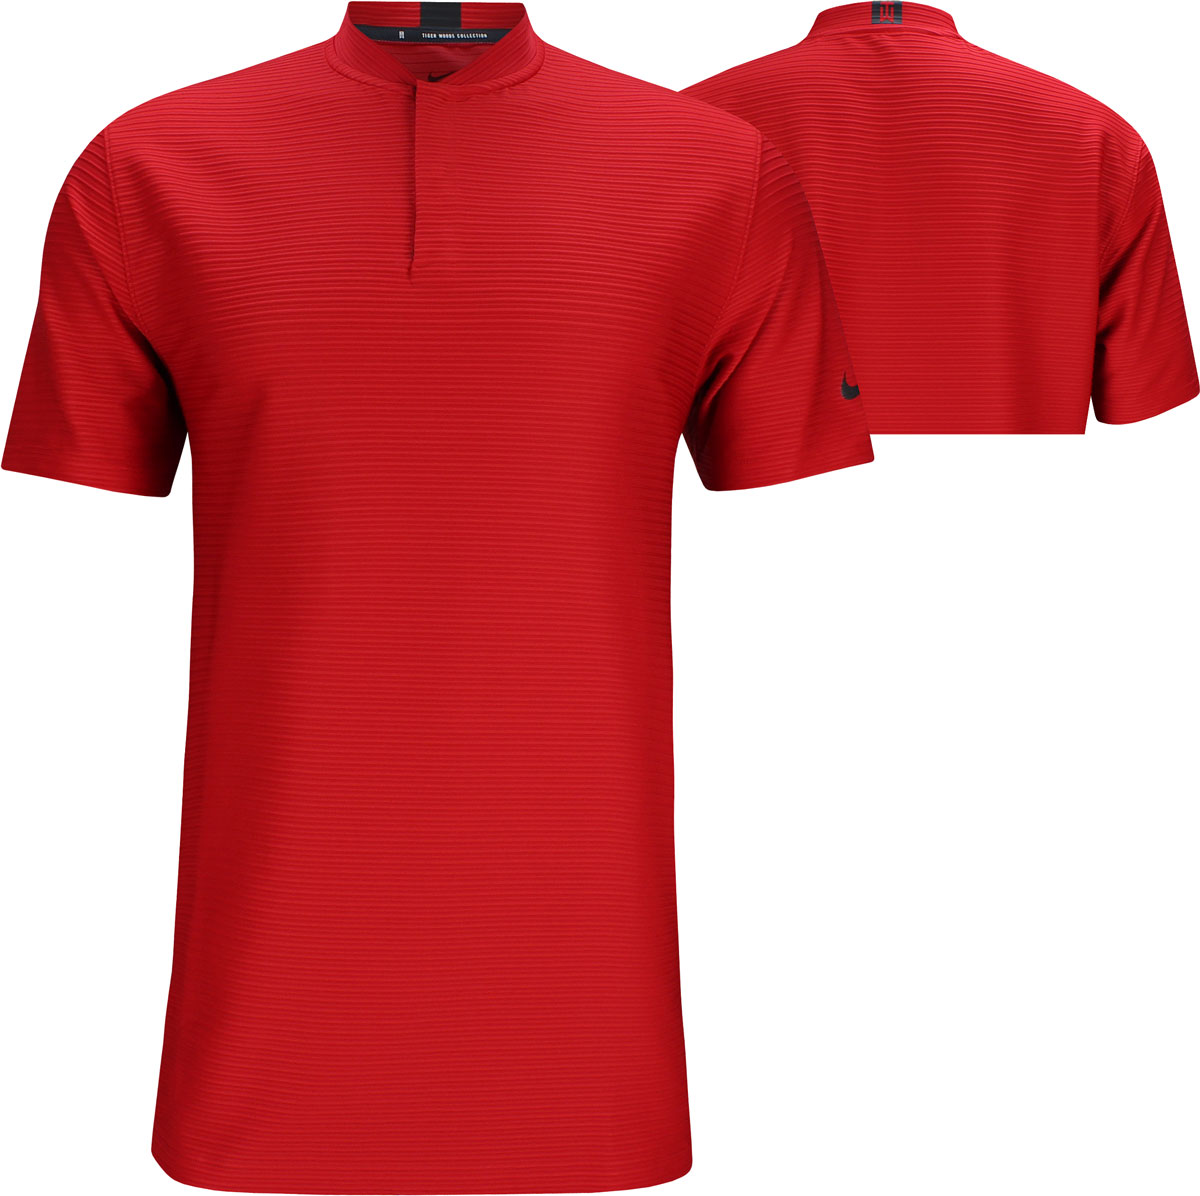 mecanismo Motivación arrastrar  Nike Dri-FIT Tiger Woods Stripe Blade Golf Shirts